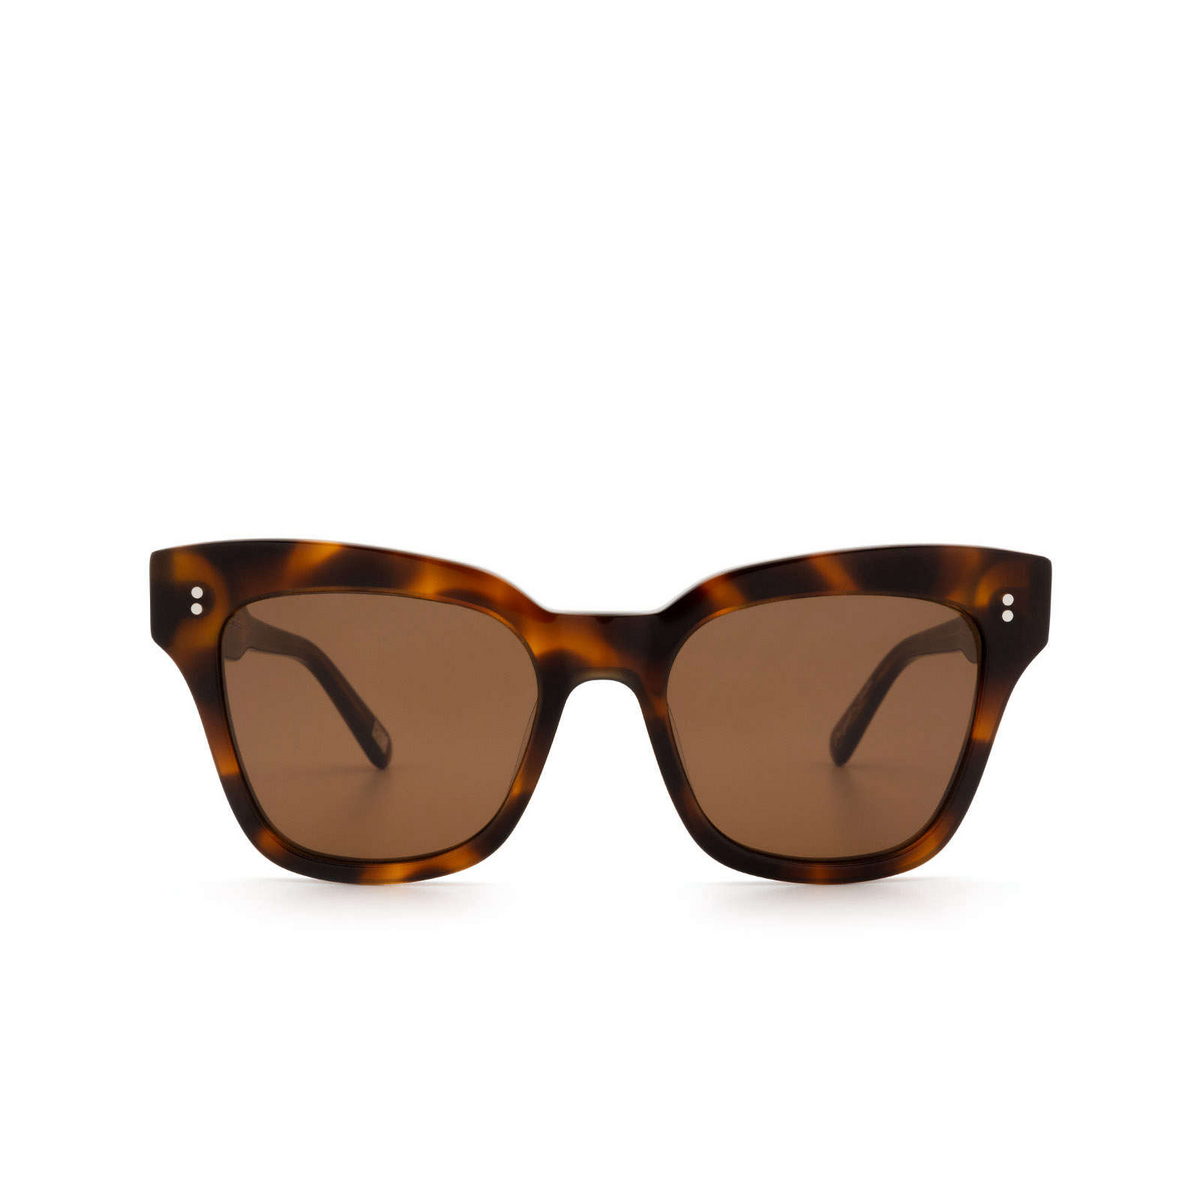 Chimi® Square Sunglasses: #005 color Tortoise Trt.